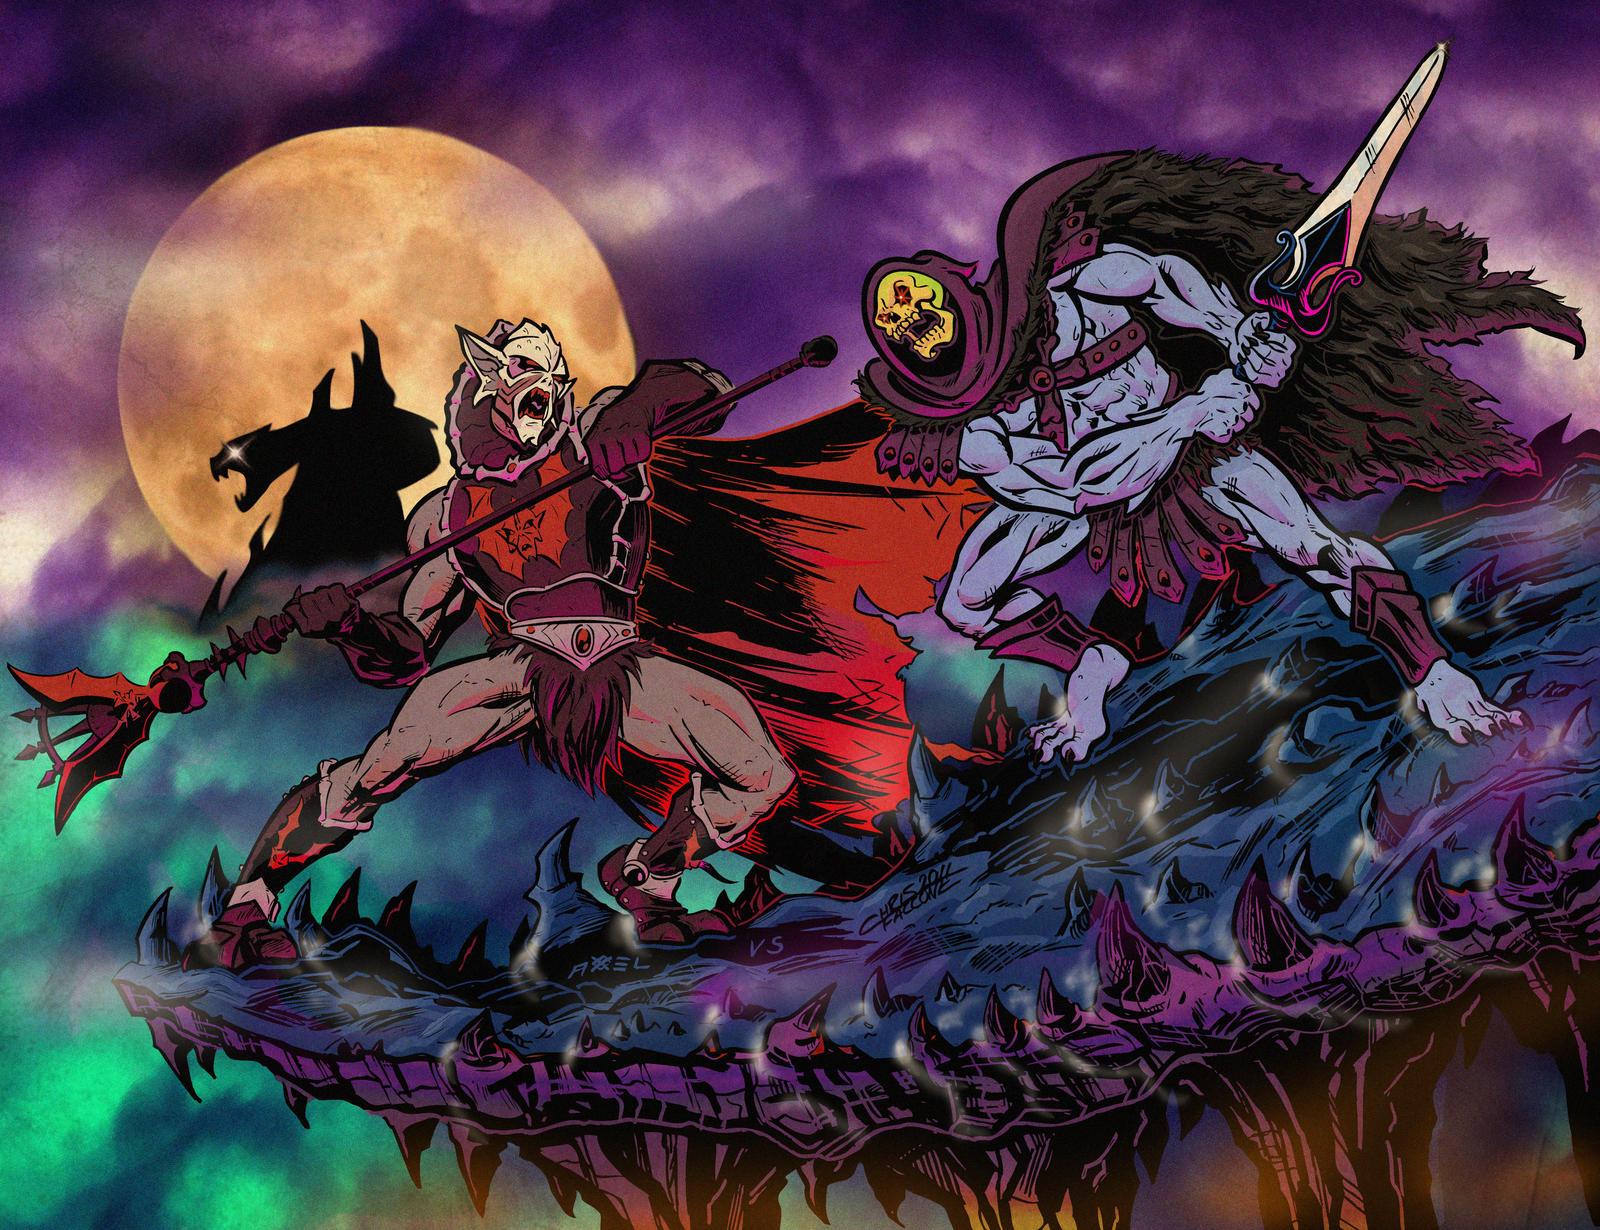 HORDAK VS SKELETOR animated by ChrisFaccone on DeviantArt